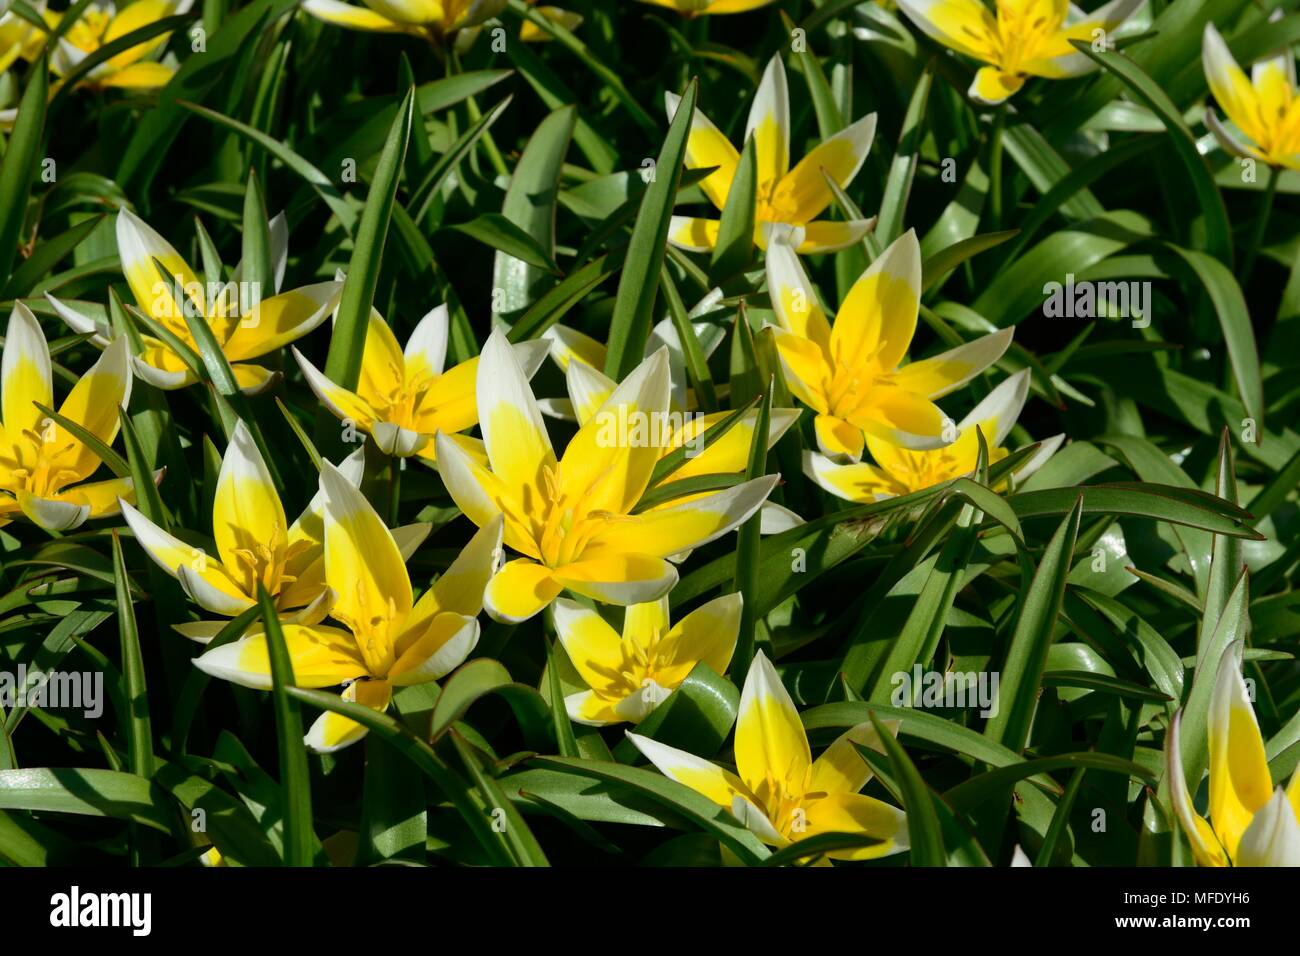 White star shaped flowers stock photos white star shaped flowers tulipa tarda or late tulip yellow and white star shaped flowers stock image mightylinksfo